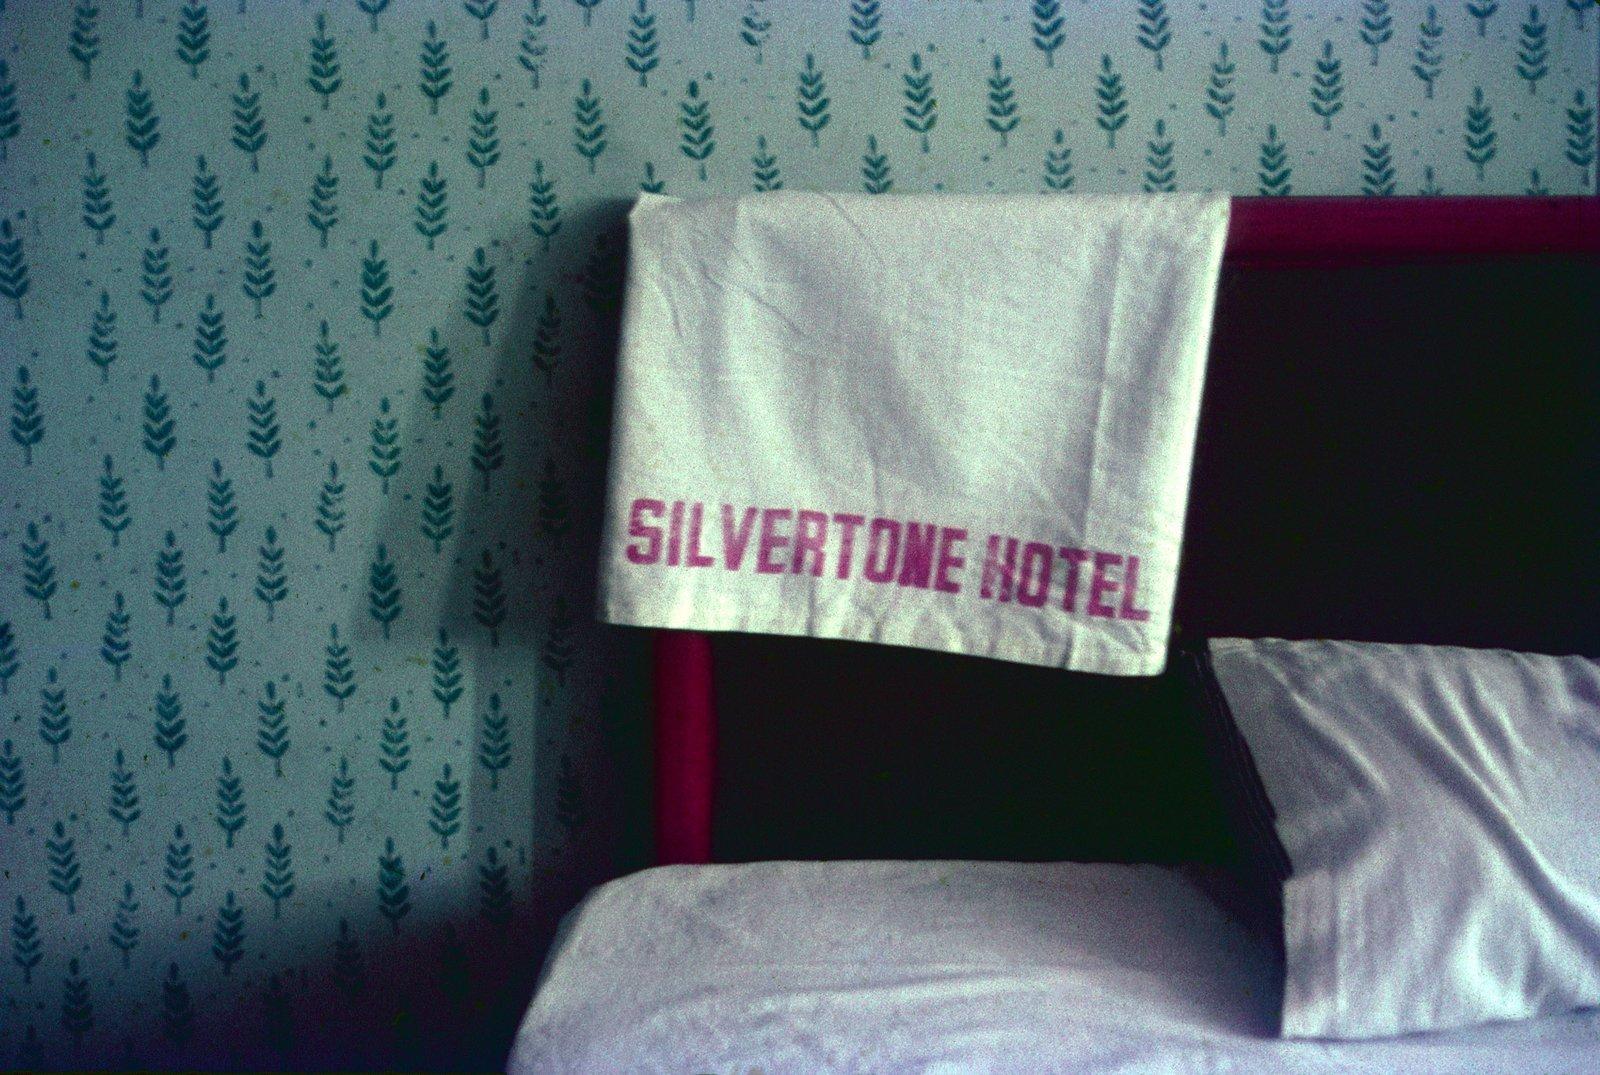 Silvertone Hotel, Baguio, Philippines